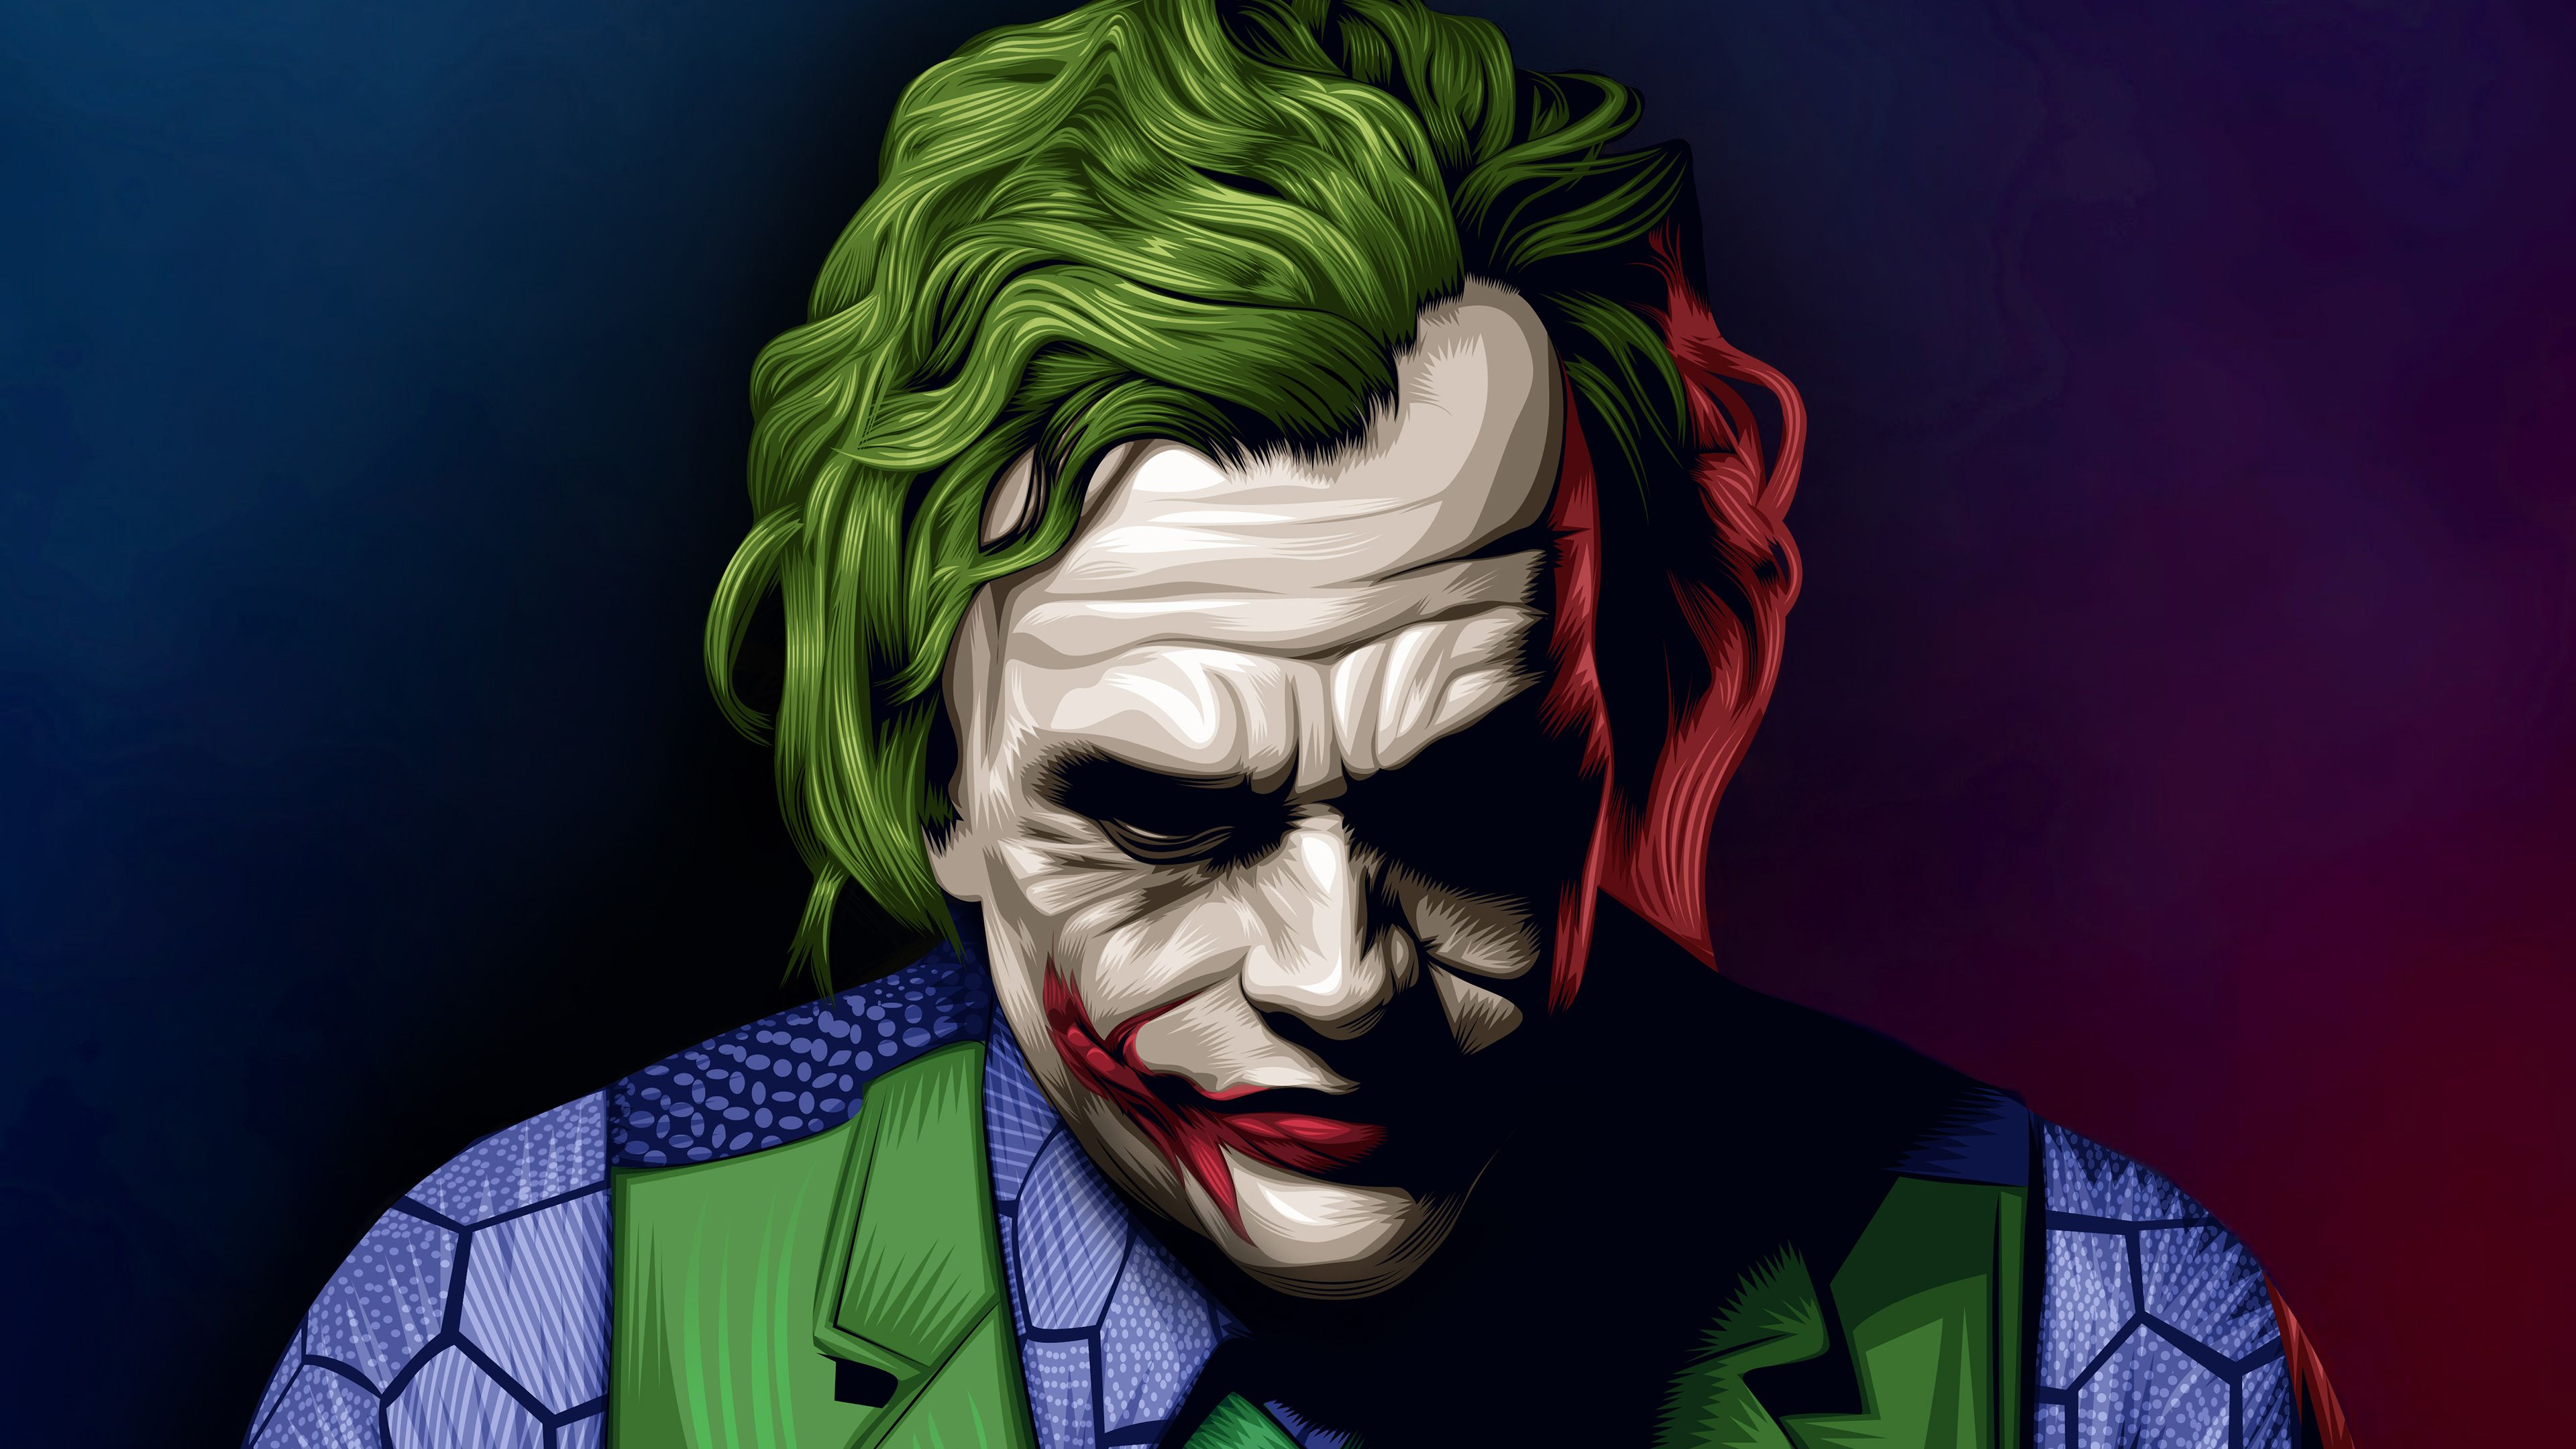 Joker Heath Ledger Illustration Superheroes Wallpapers Joker Wallpapers Hd Wallpapers Digital Art Wal Joker Wallpapers Joker 3d Wallpaper Joker Hd Wallpaper